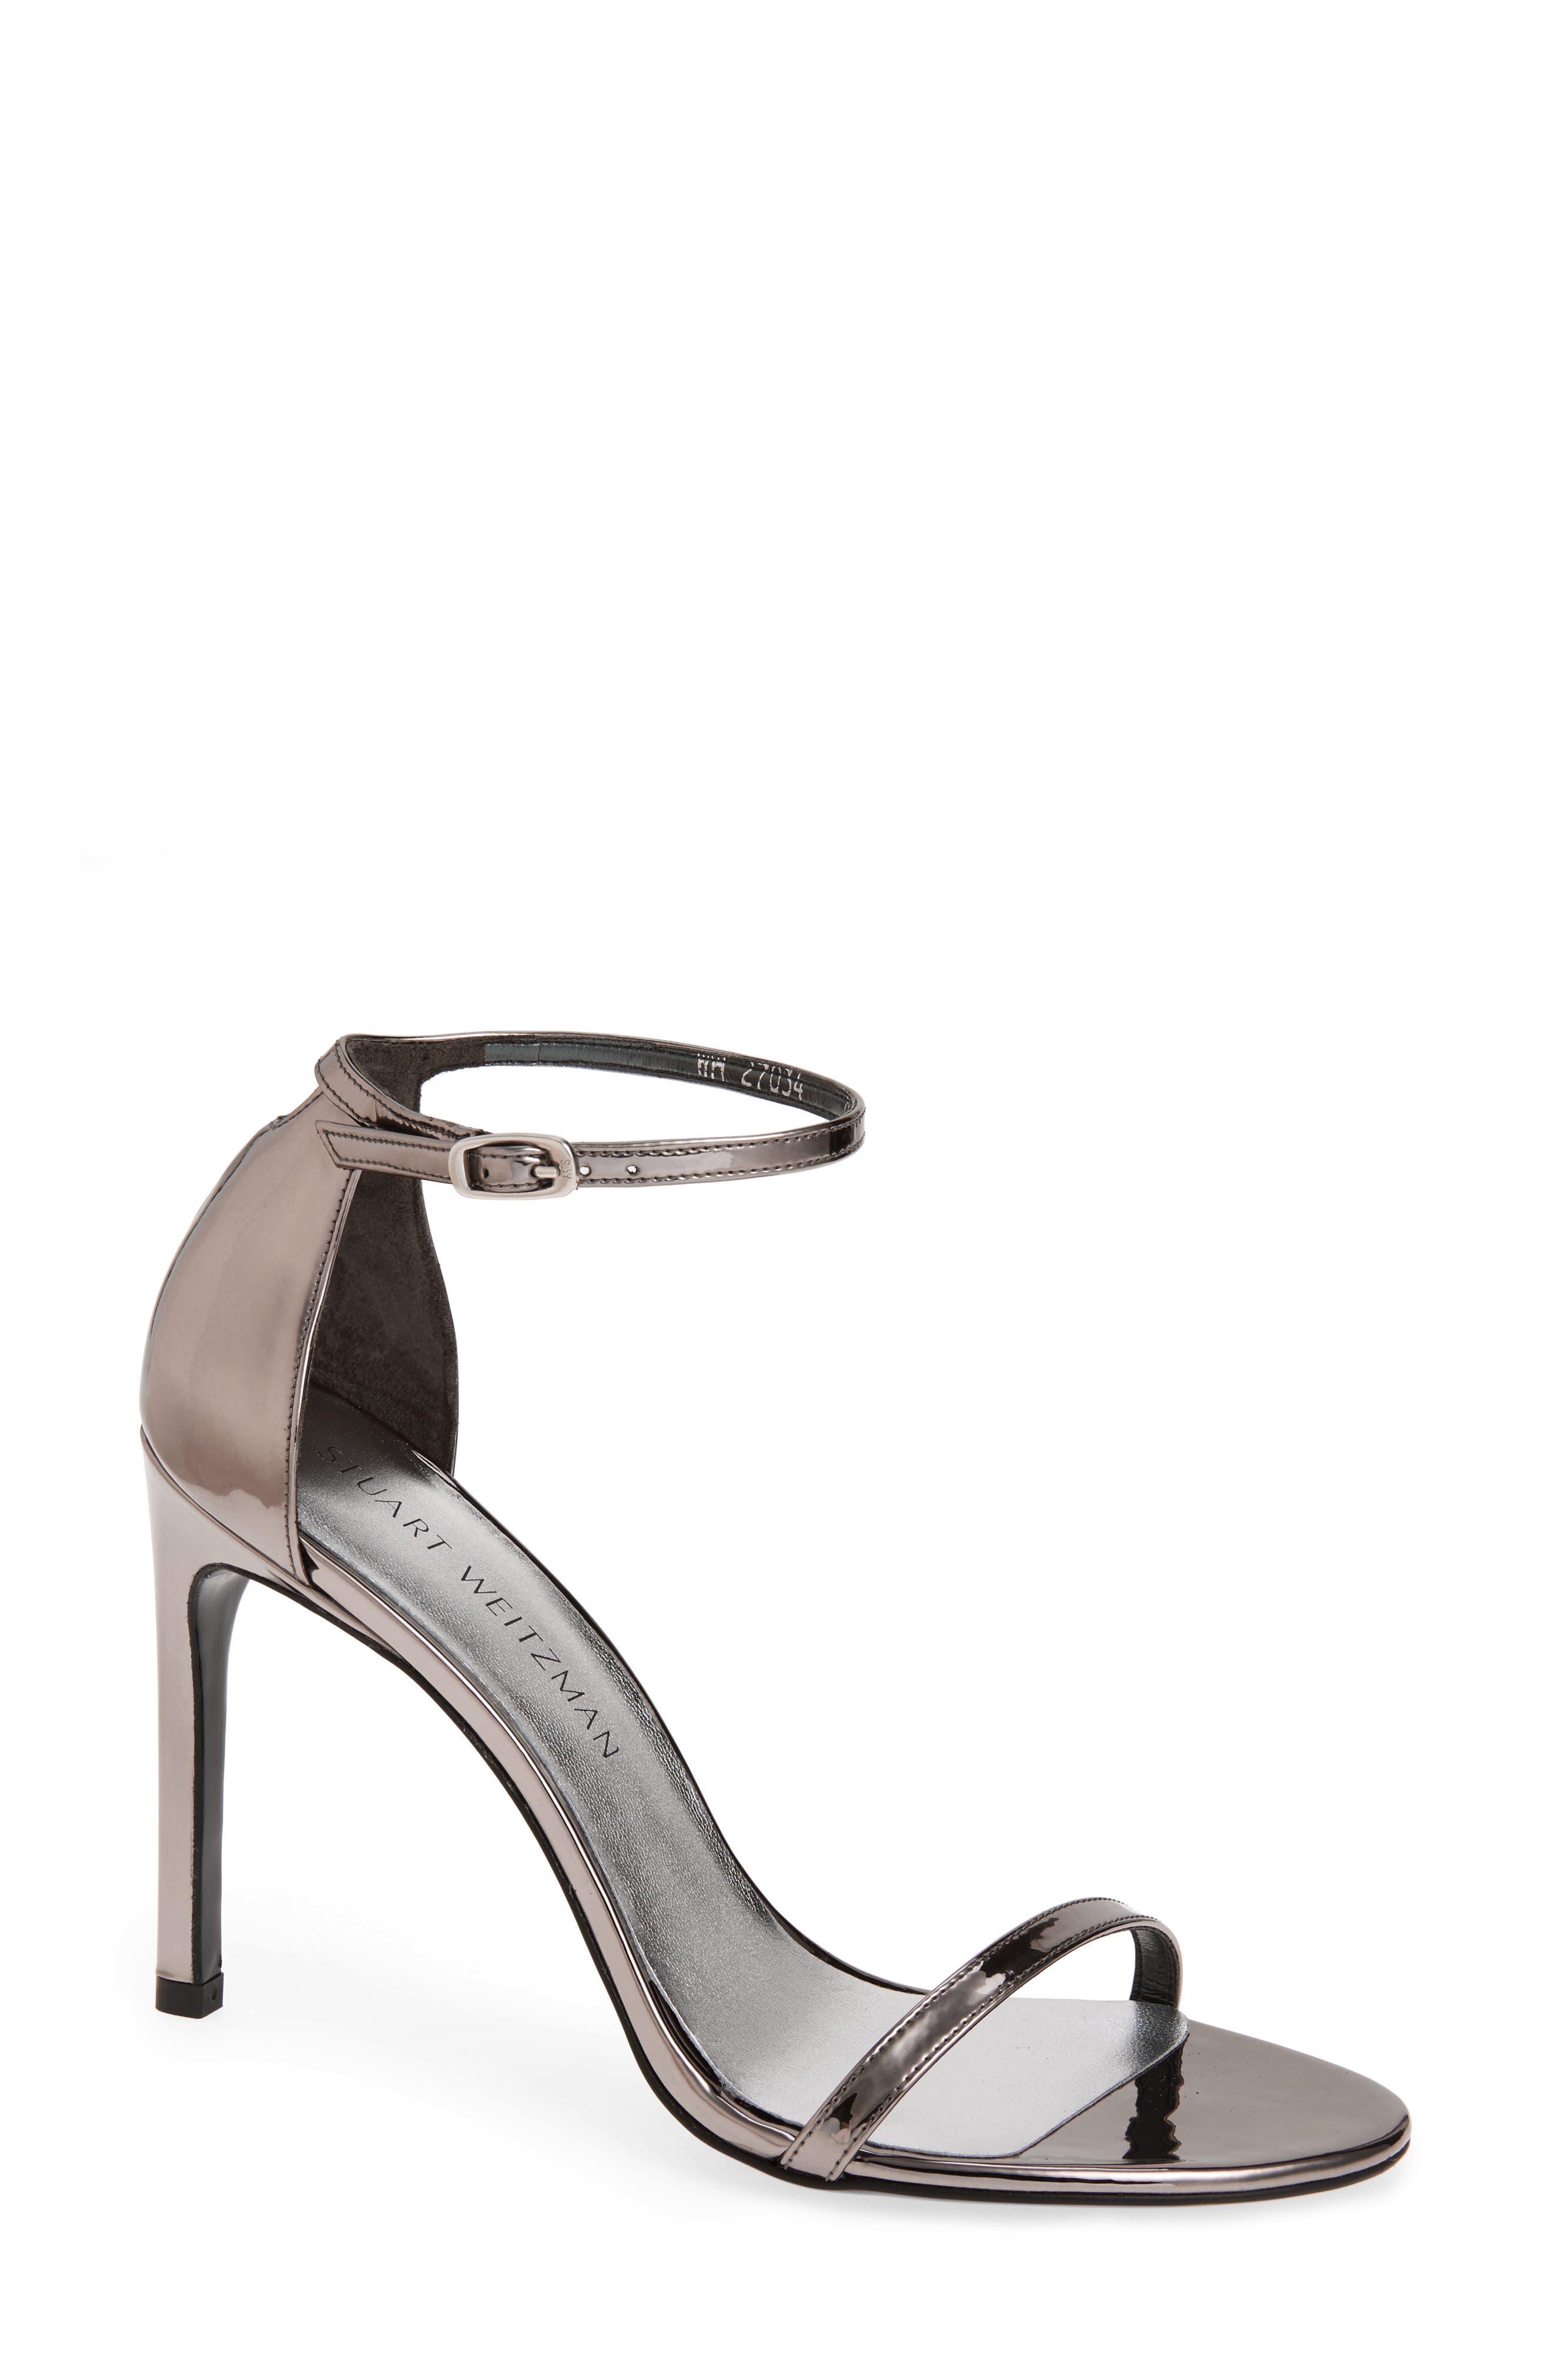 Stuart Weitzman Nudistsong Ankle Strap Sandal (Women)